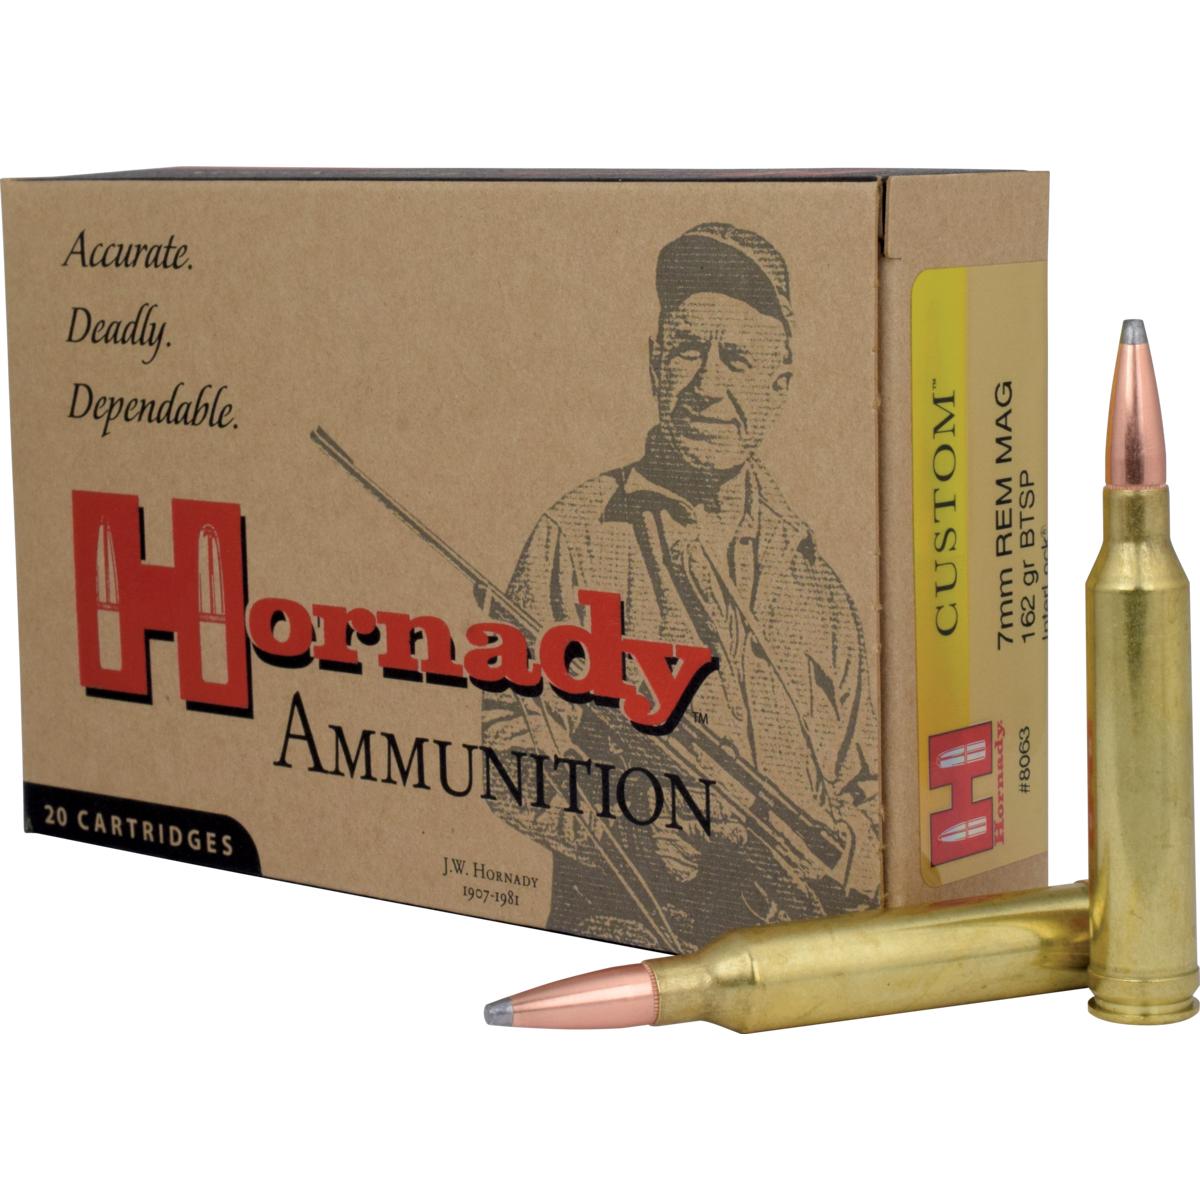 Hornady 7mm Remington Magnum Custom Ammunition 20 Rounds, BTSP, 162 Grains